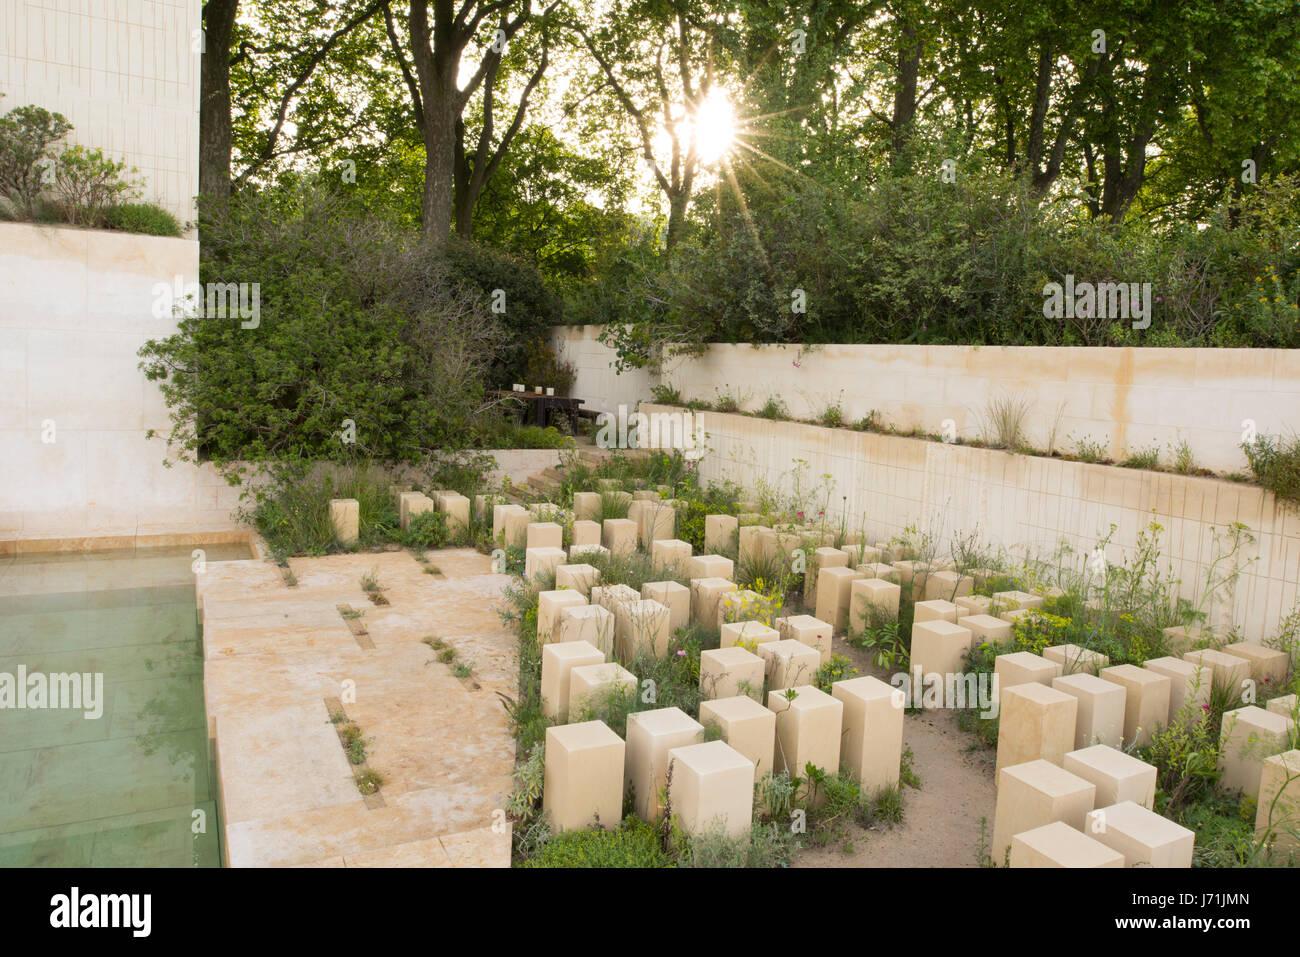 maltese limestone stock photos & maltese limestone stock images